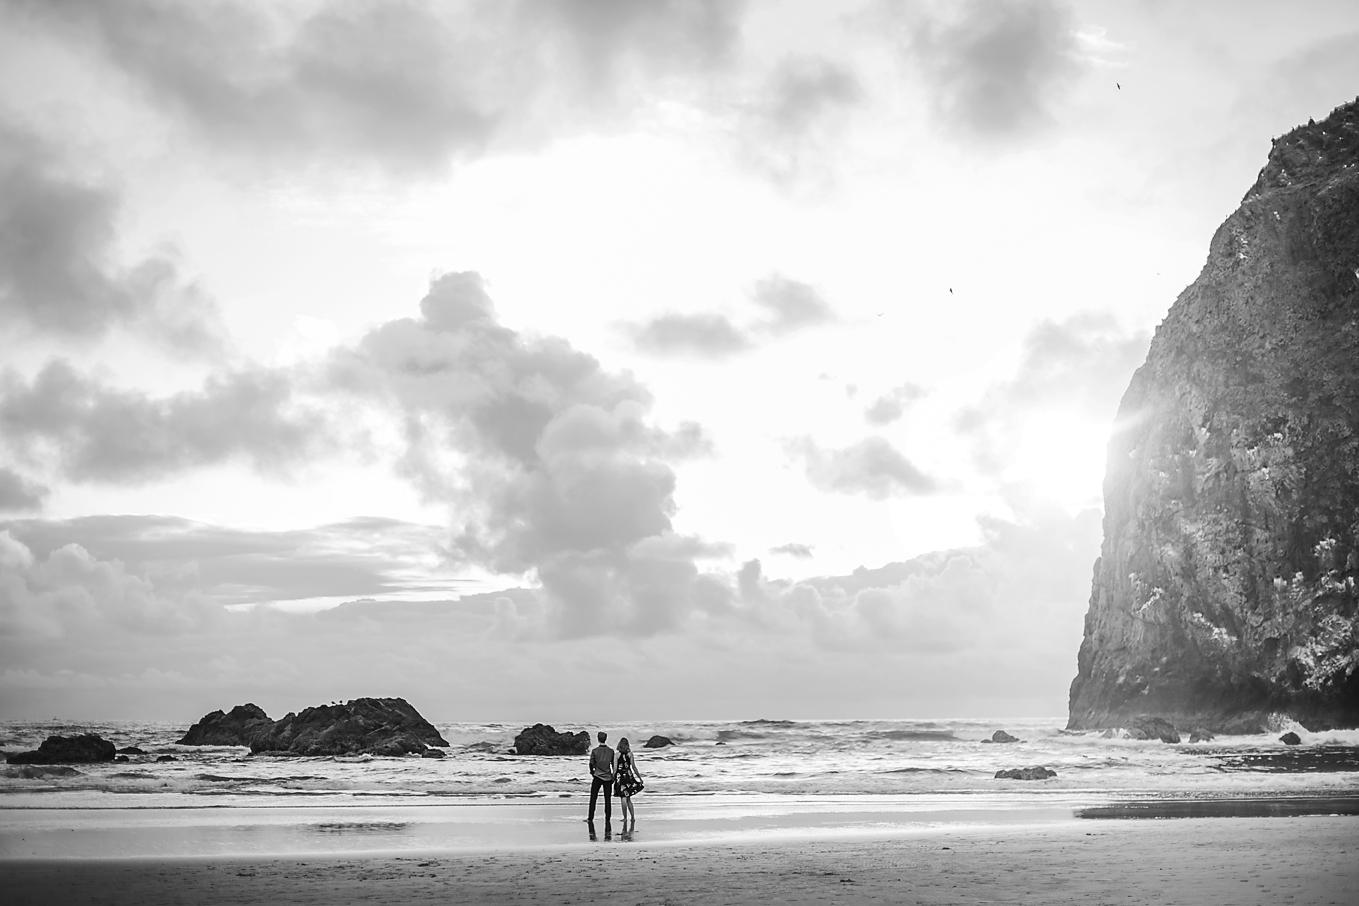 Amanda + Matt - Oregon Coast Elopement Photography - Oregon Cannon Beach Elopement Photographer - Emily & Co. Photography (3).jpg